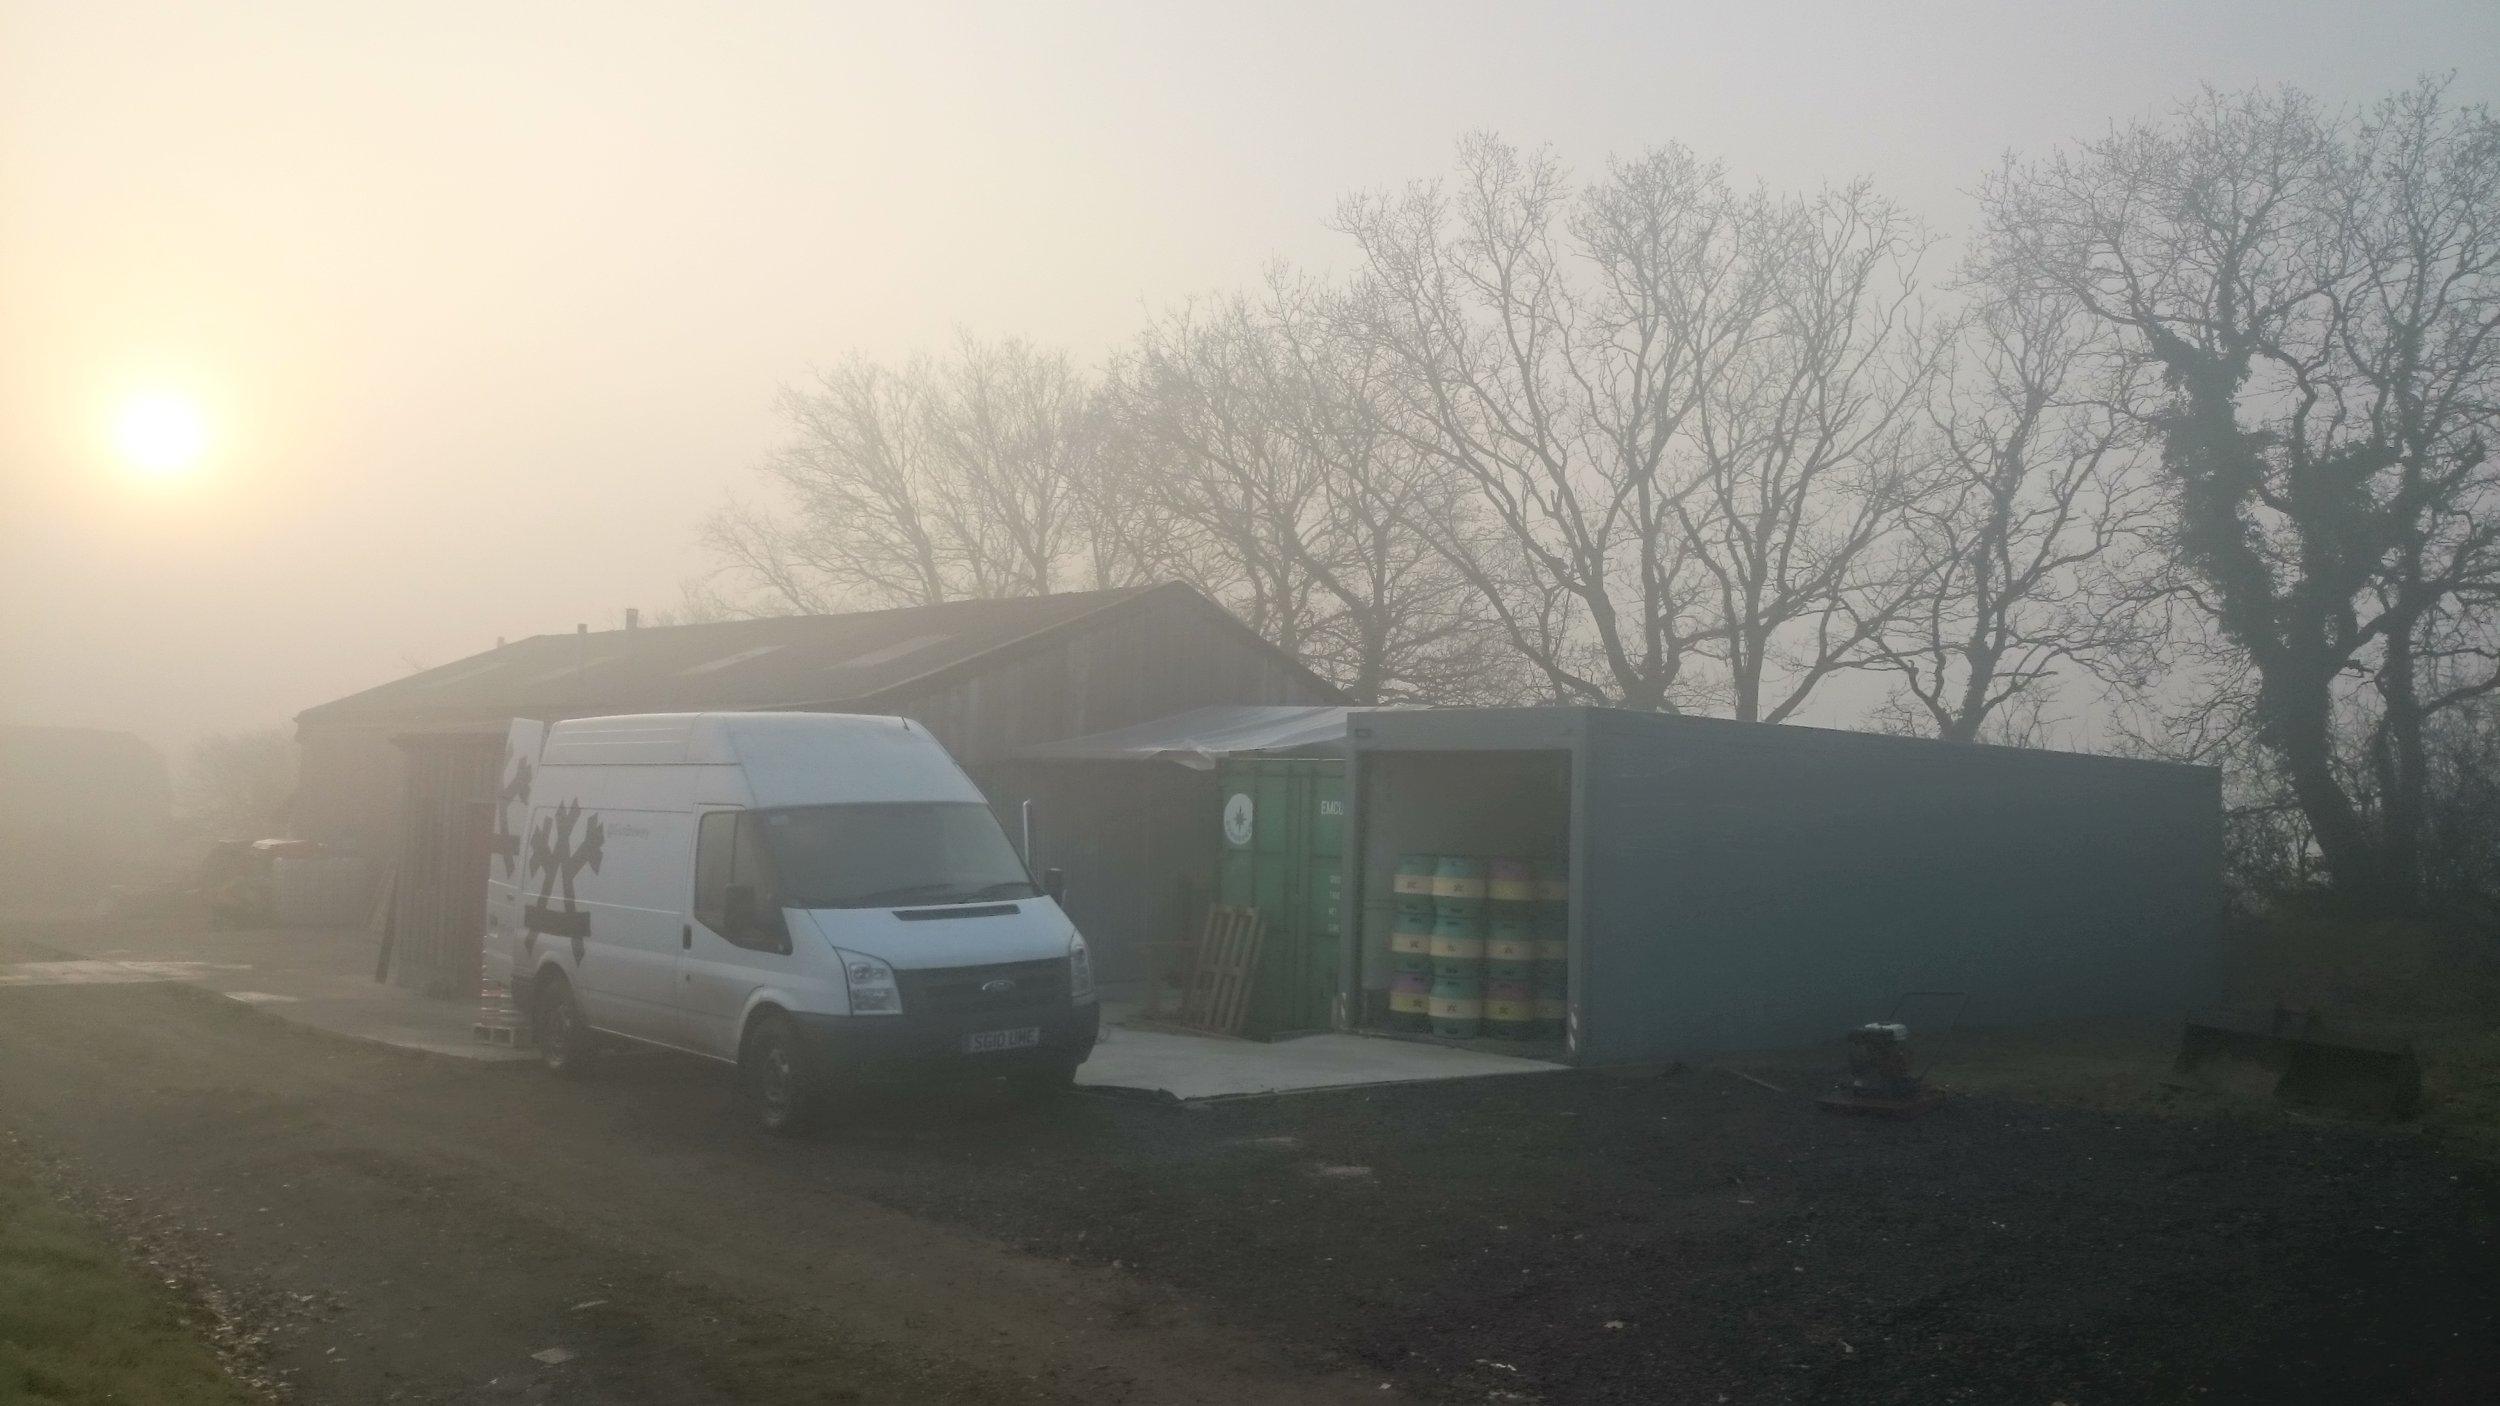 Misty day at Gun Brewery